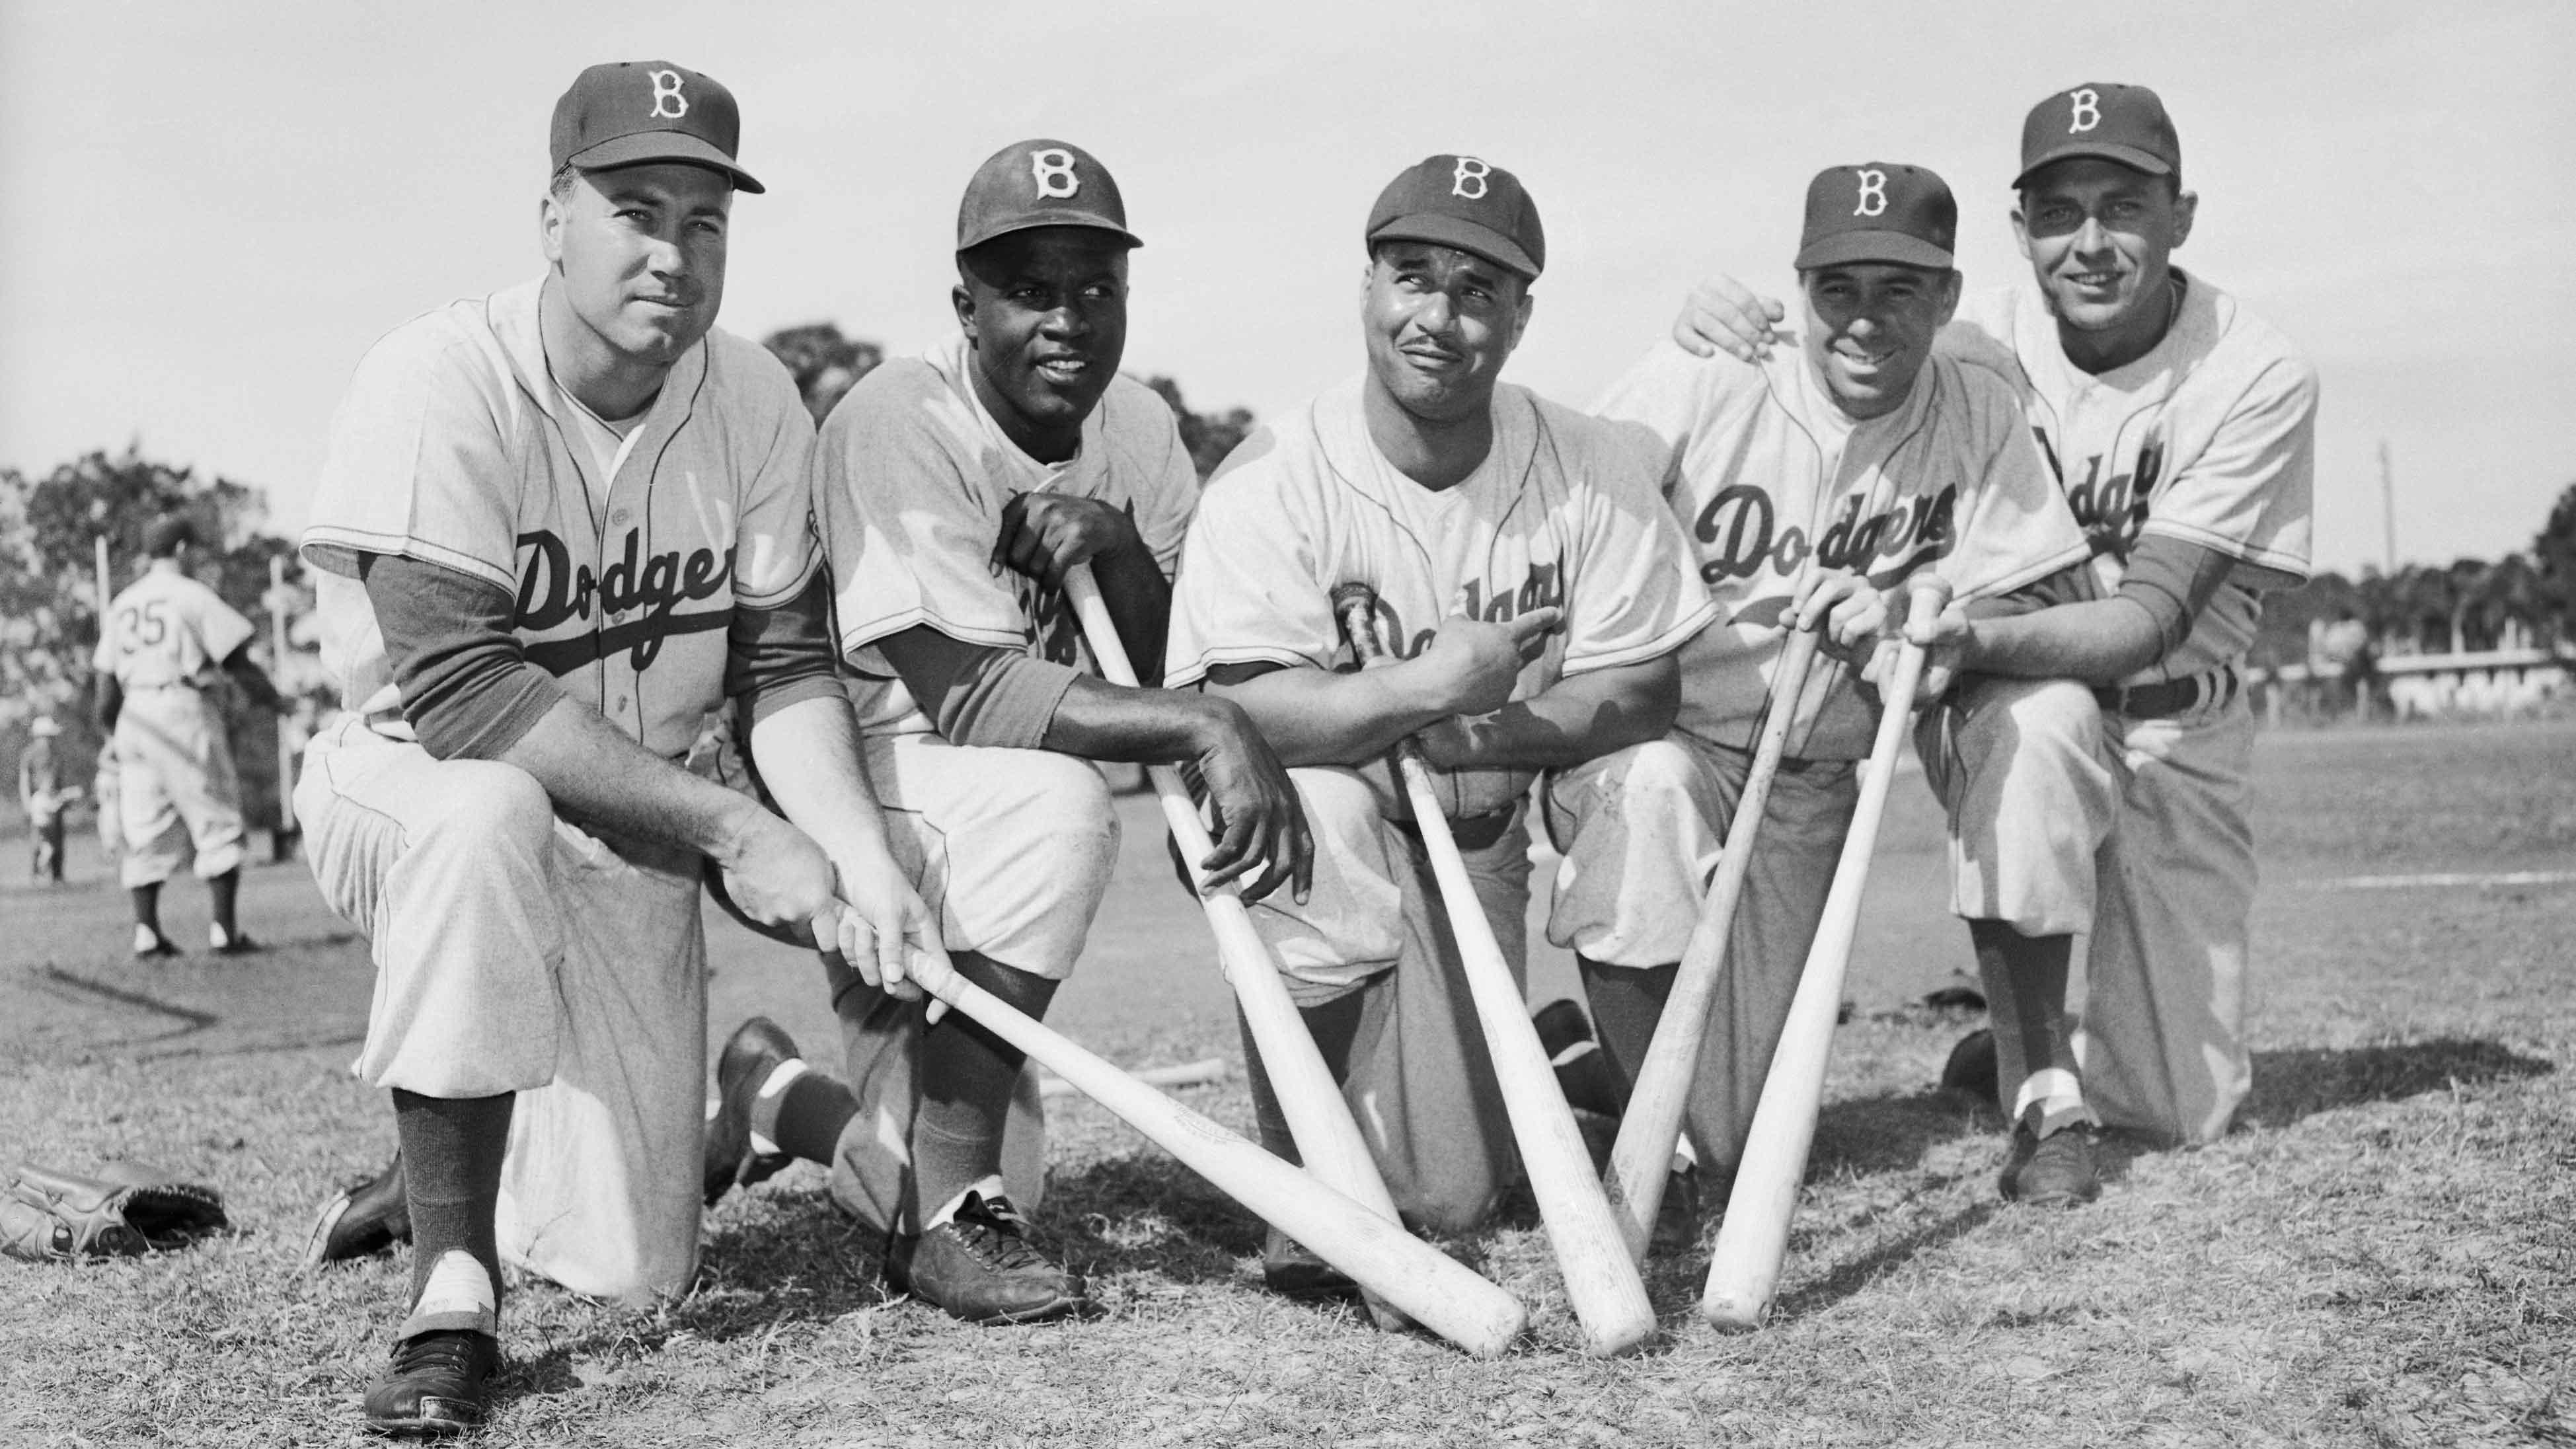 Dodgers Teammates Posing with Baseball Bats